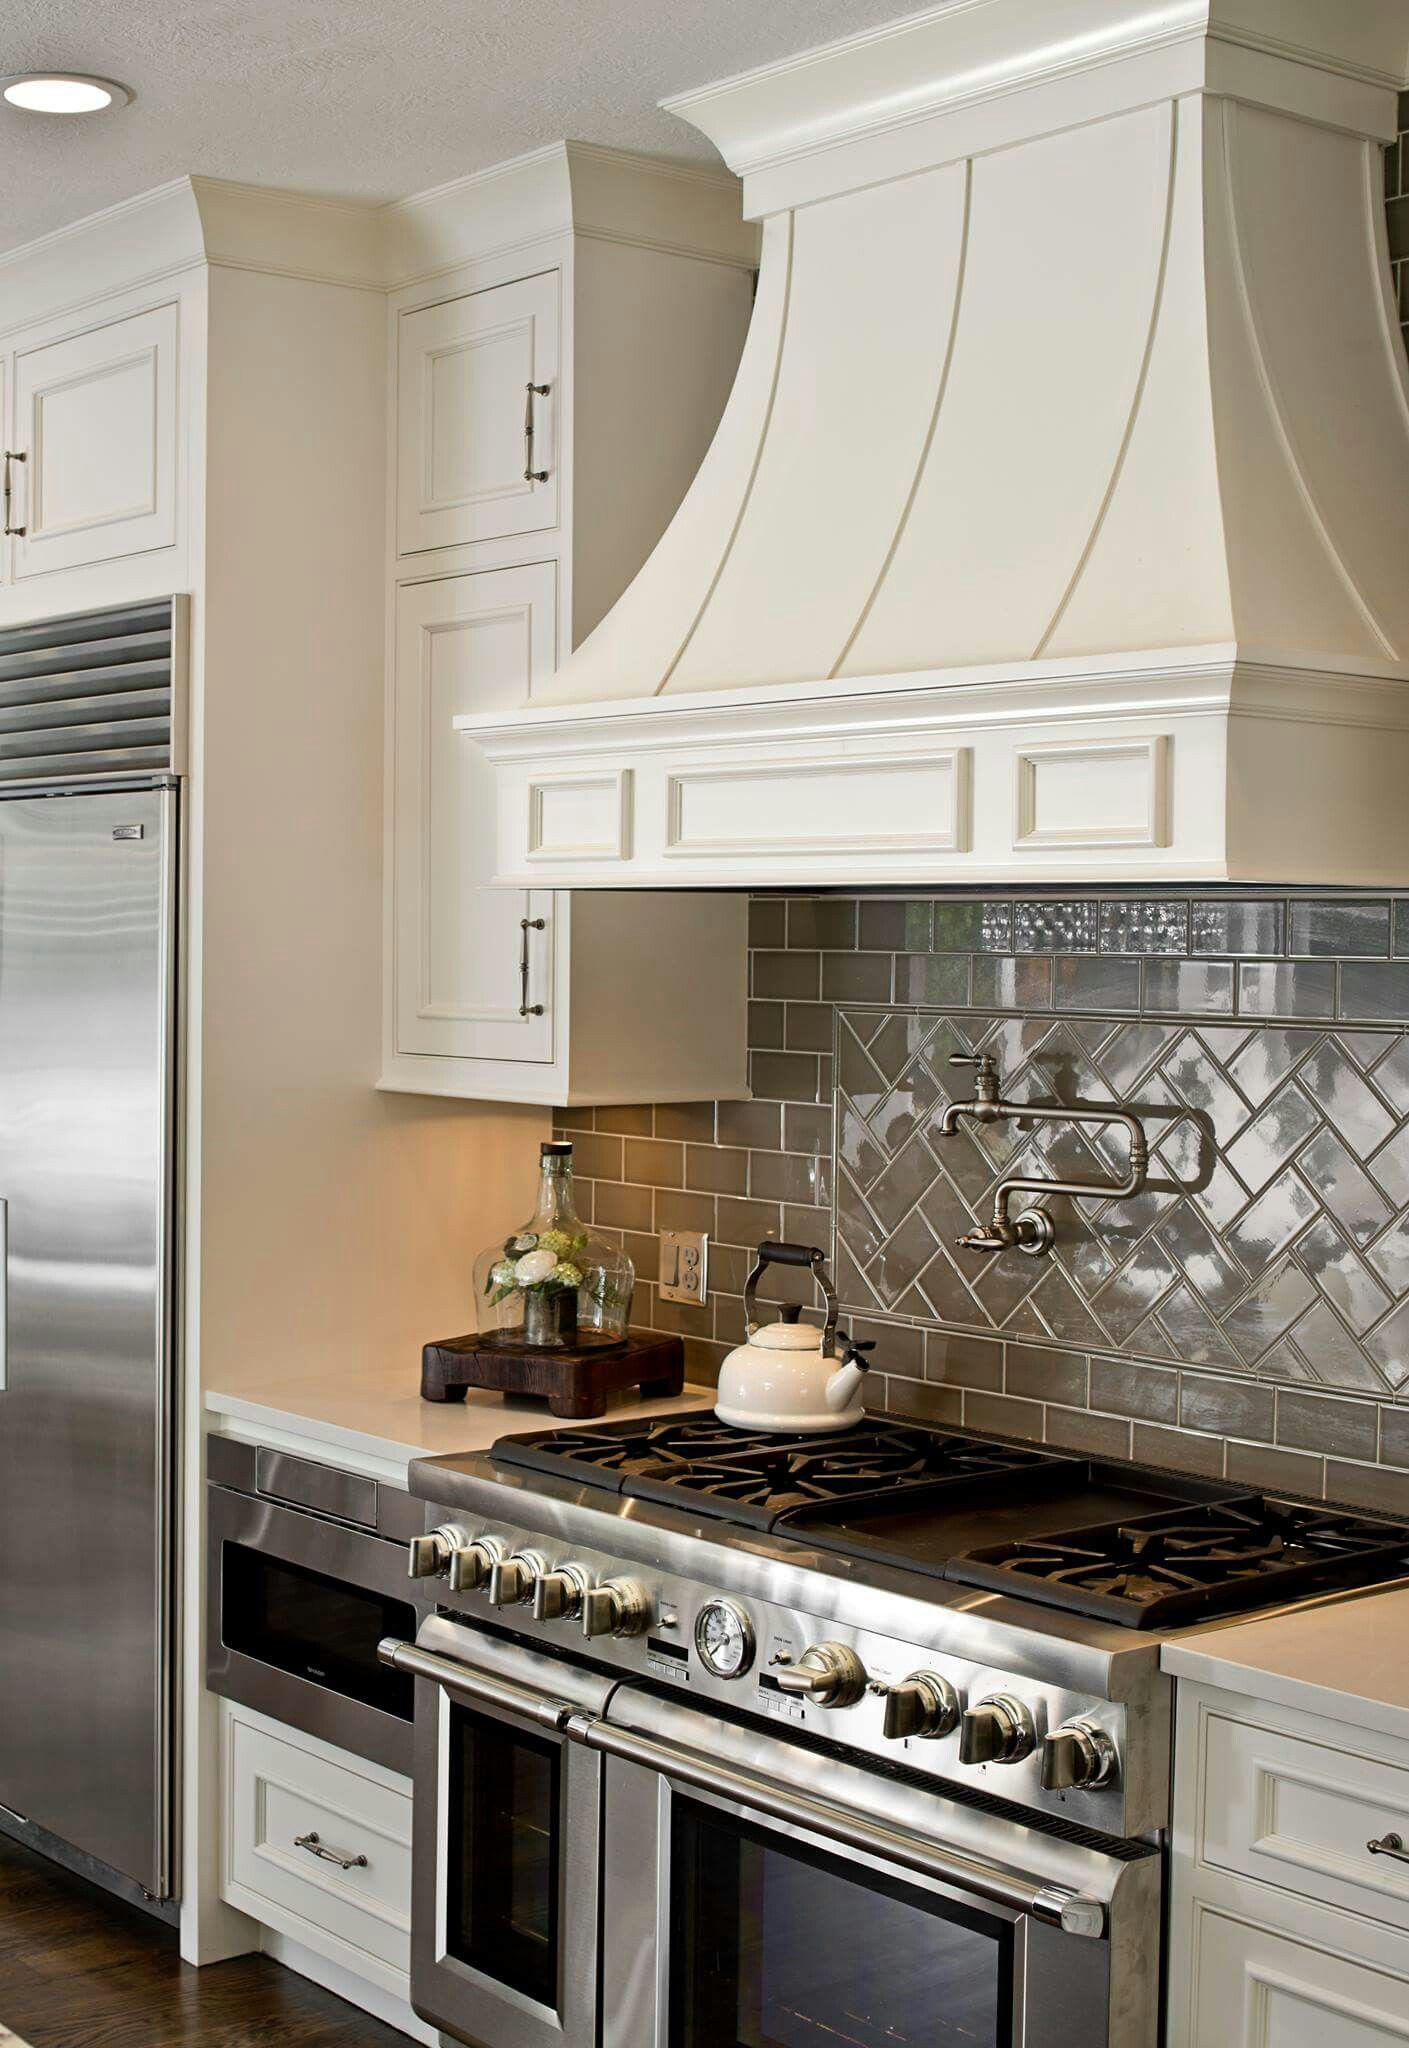 Pin By Farouk Kandil On Kitchen Redo Kitchen Cabinet Design Modern Kitchen Design Modern Kitchen